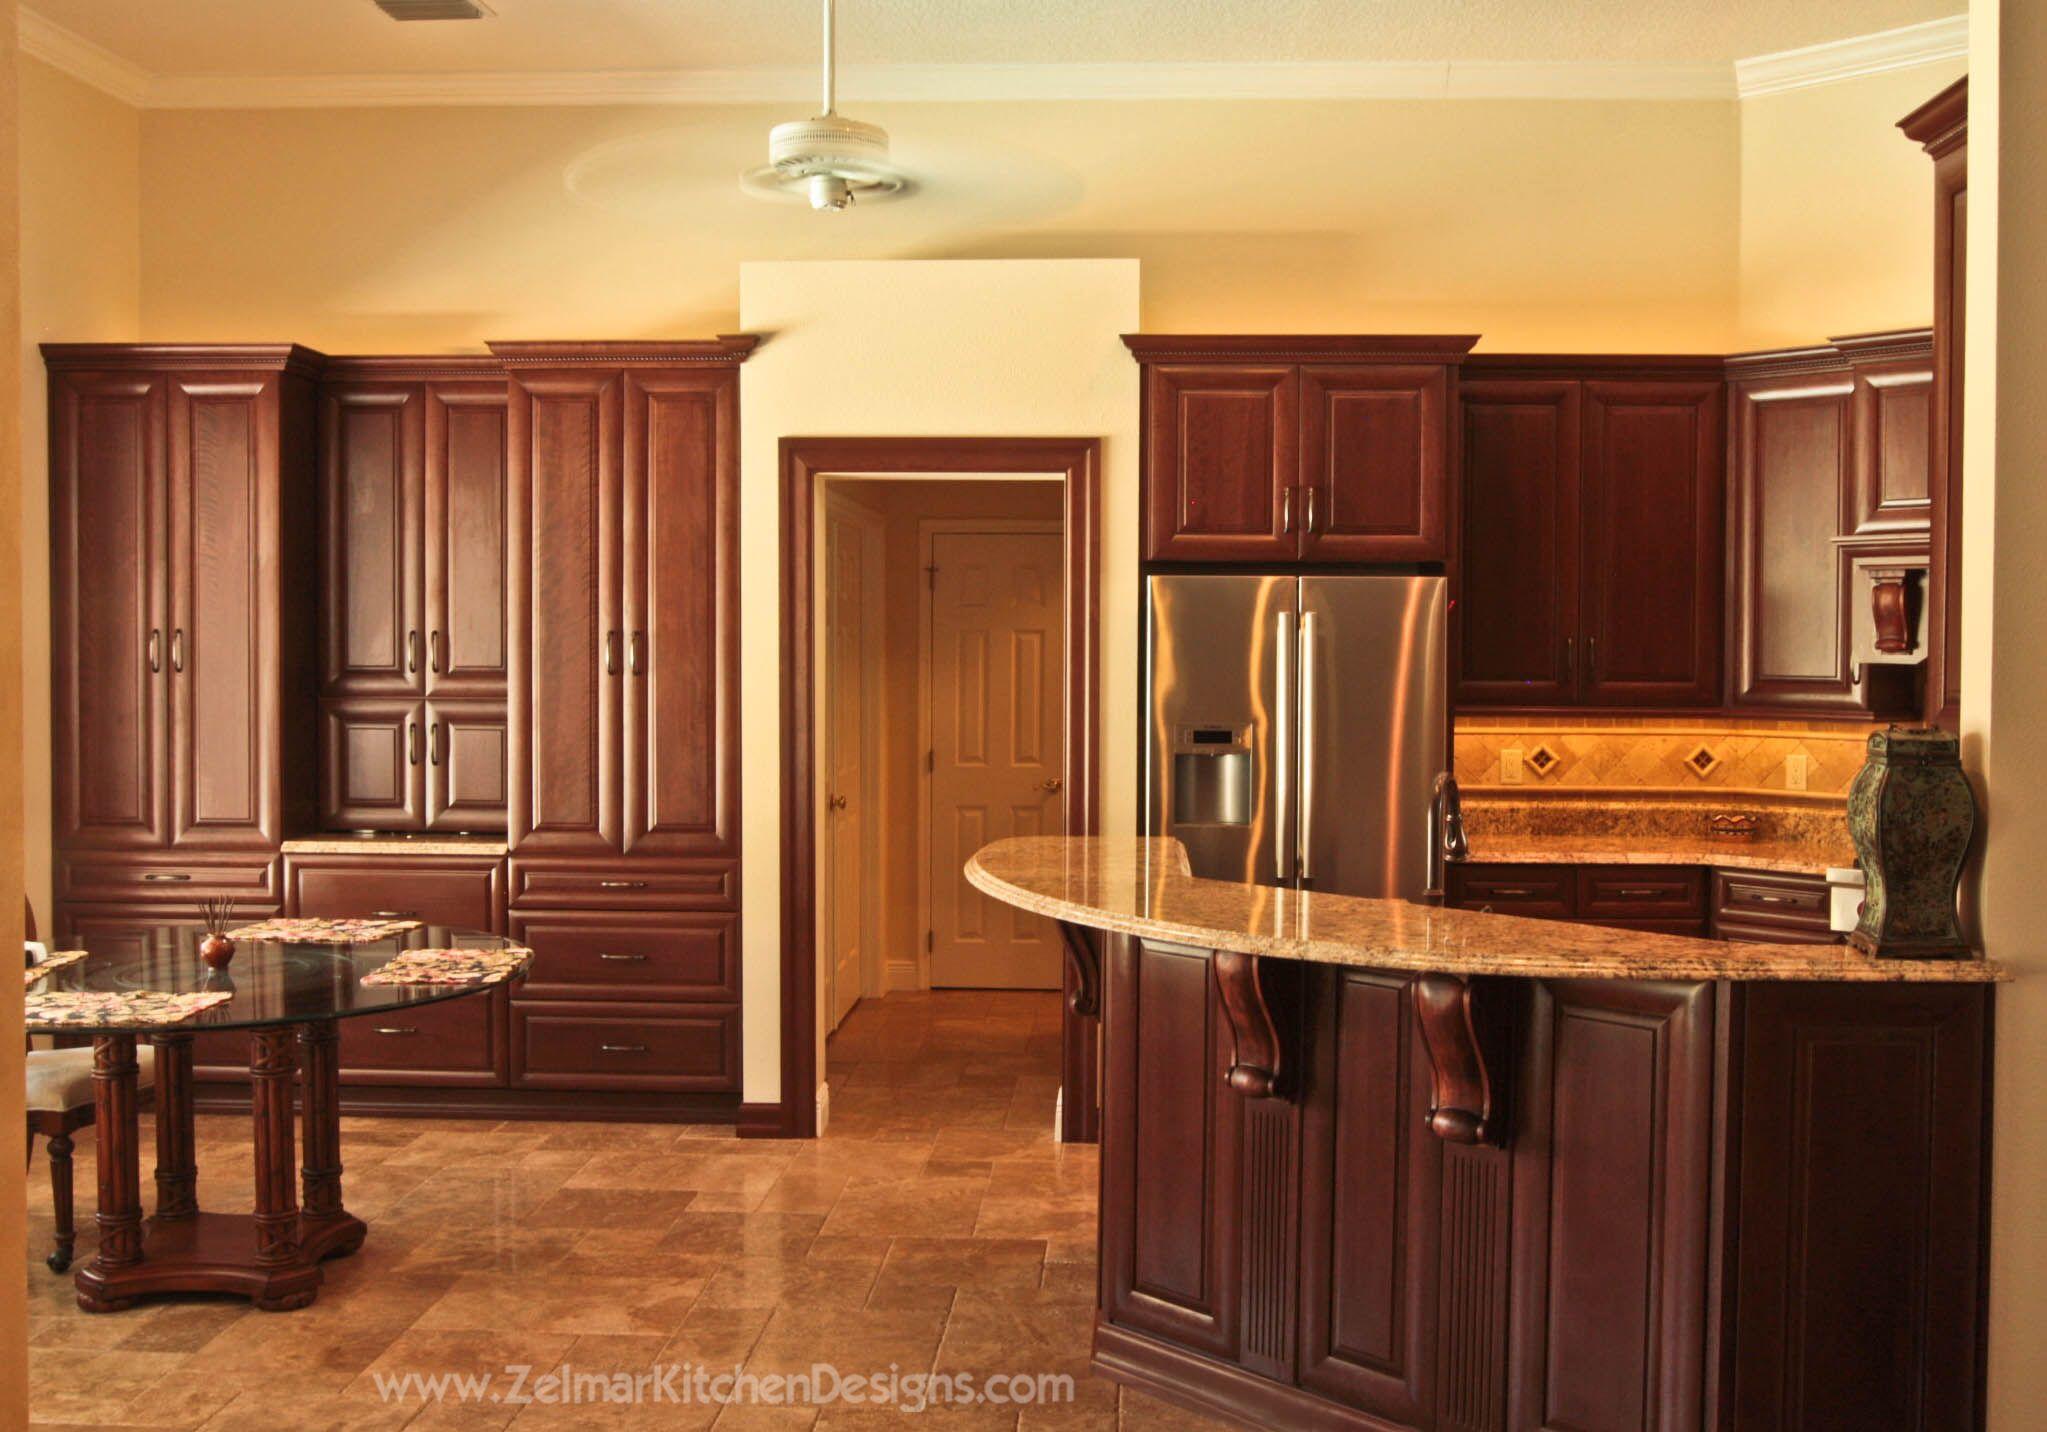 Zelmar Designs Orlando Custom Kitchen Bathroom Cabinet Remodeling